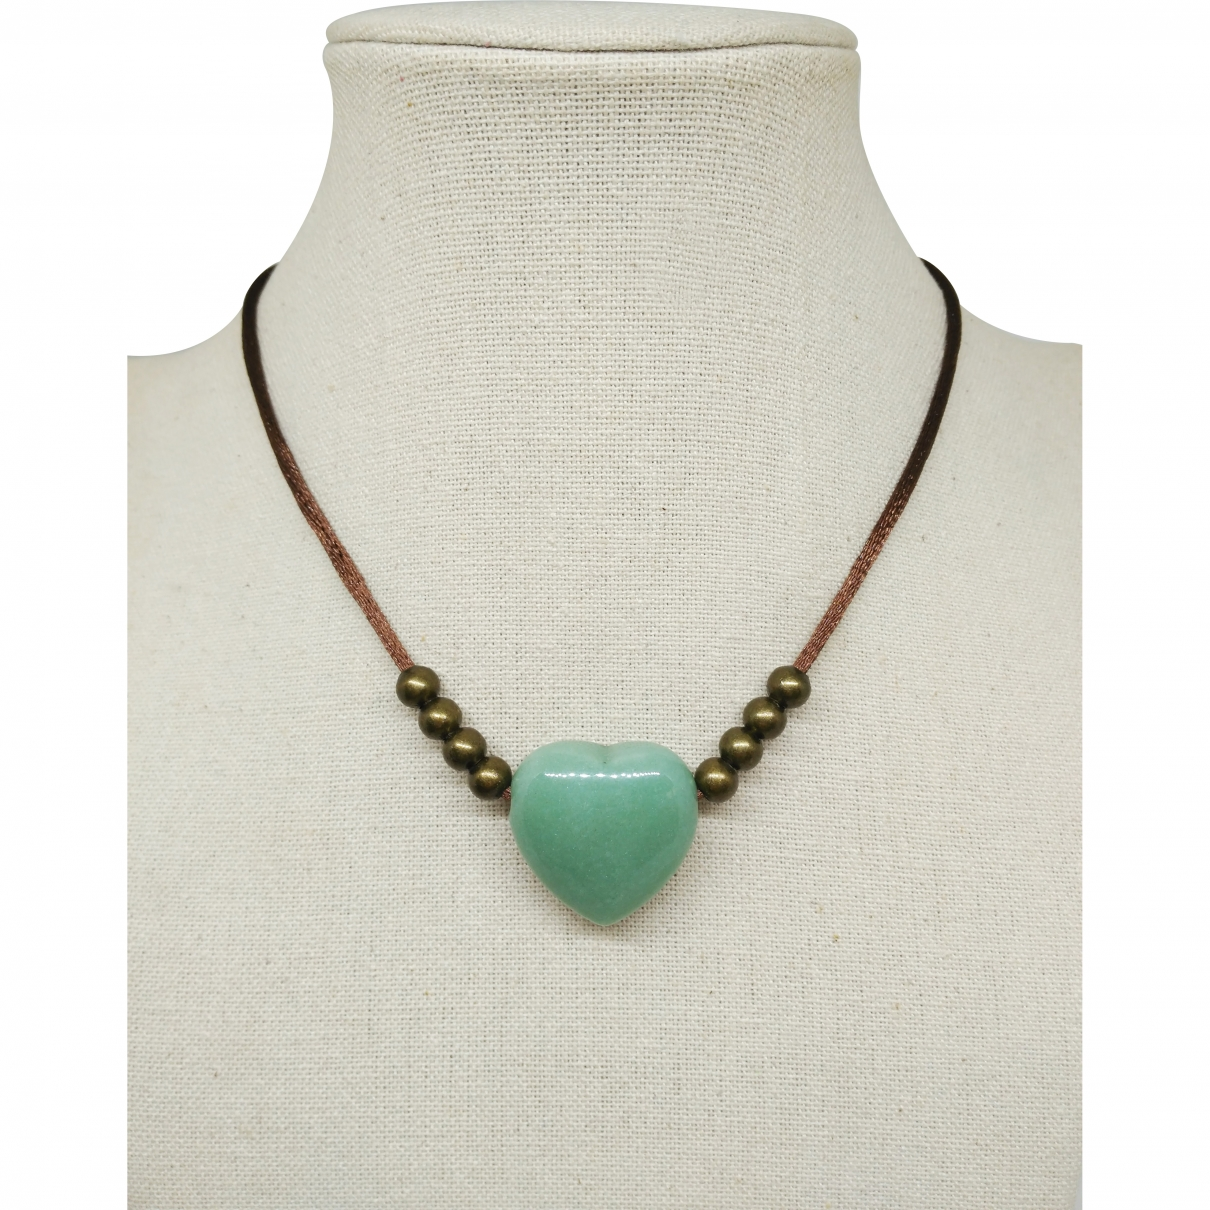 - Collier Motifs Coeurs pour femme en jade - vert